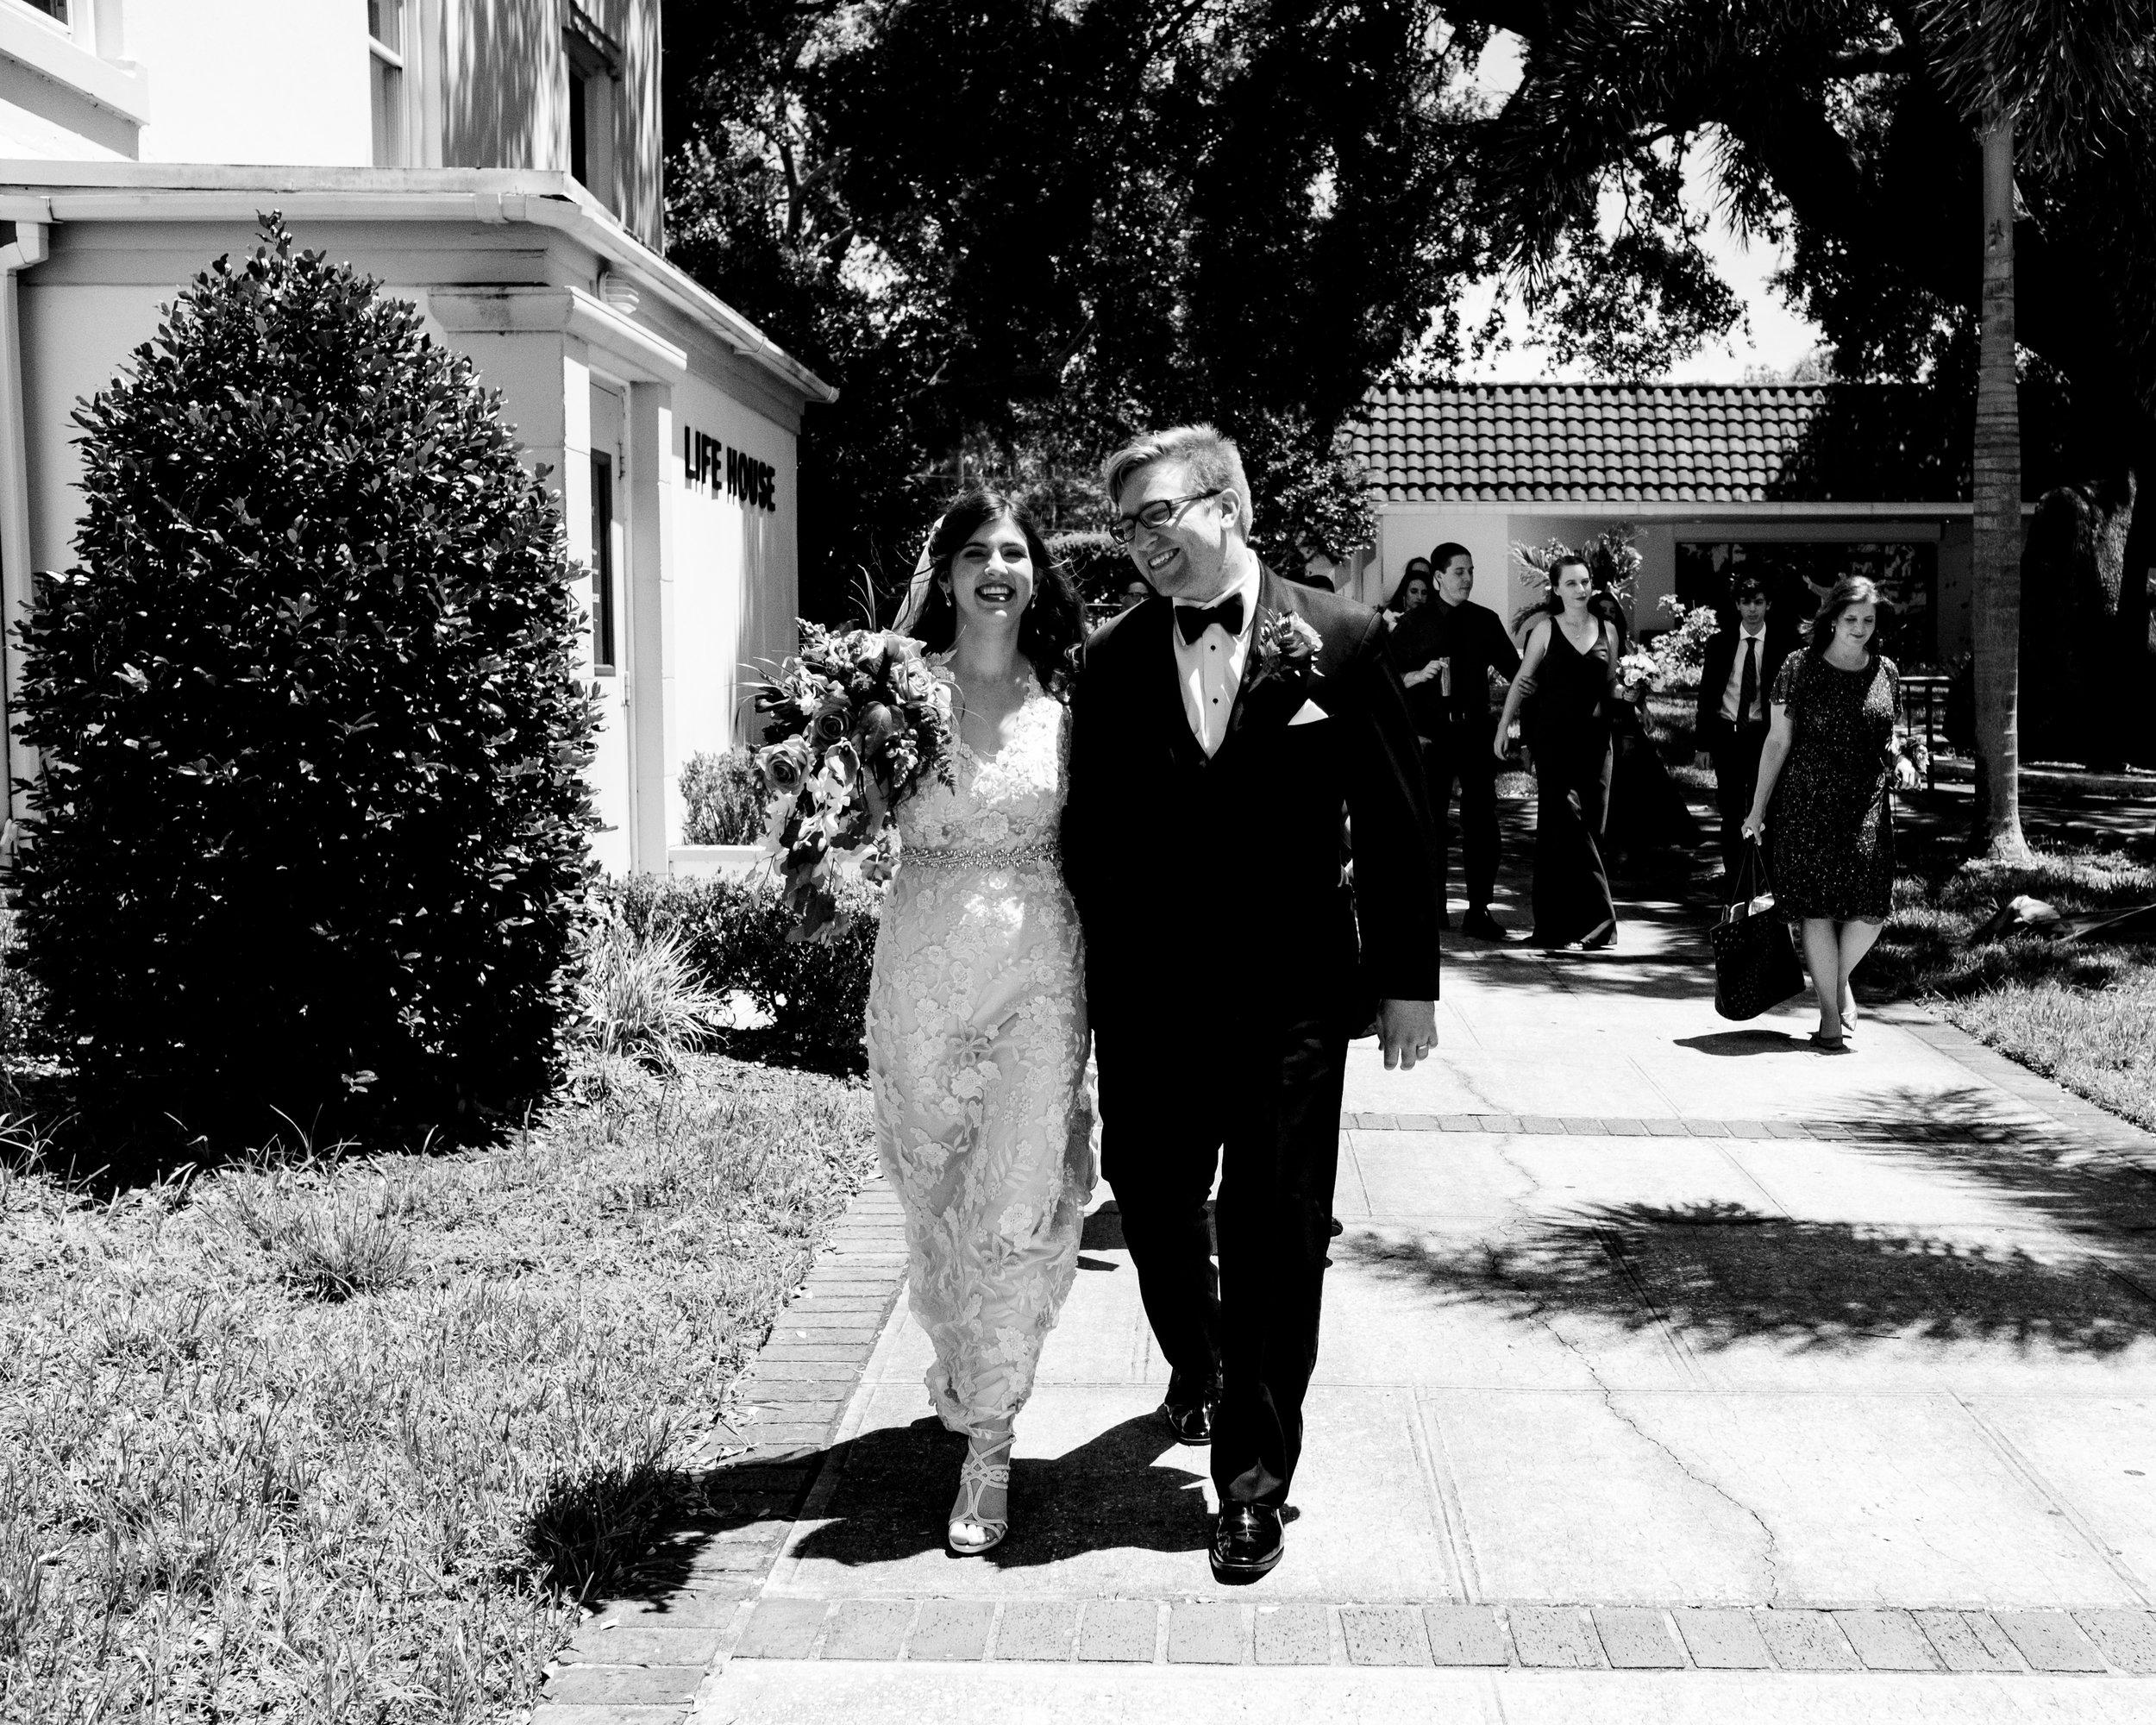 HAH_Zoe and Daniel_Clearwater Wedding_357_2018.jpg